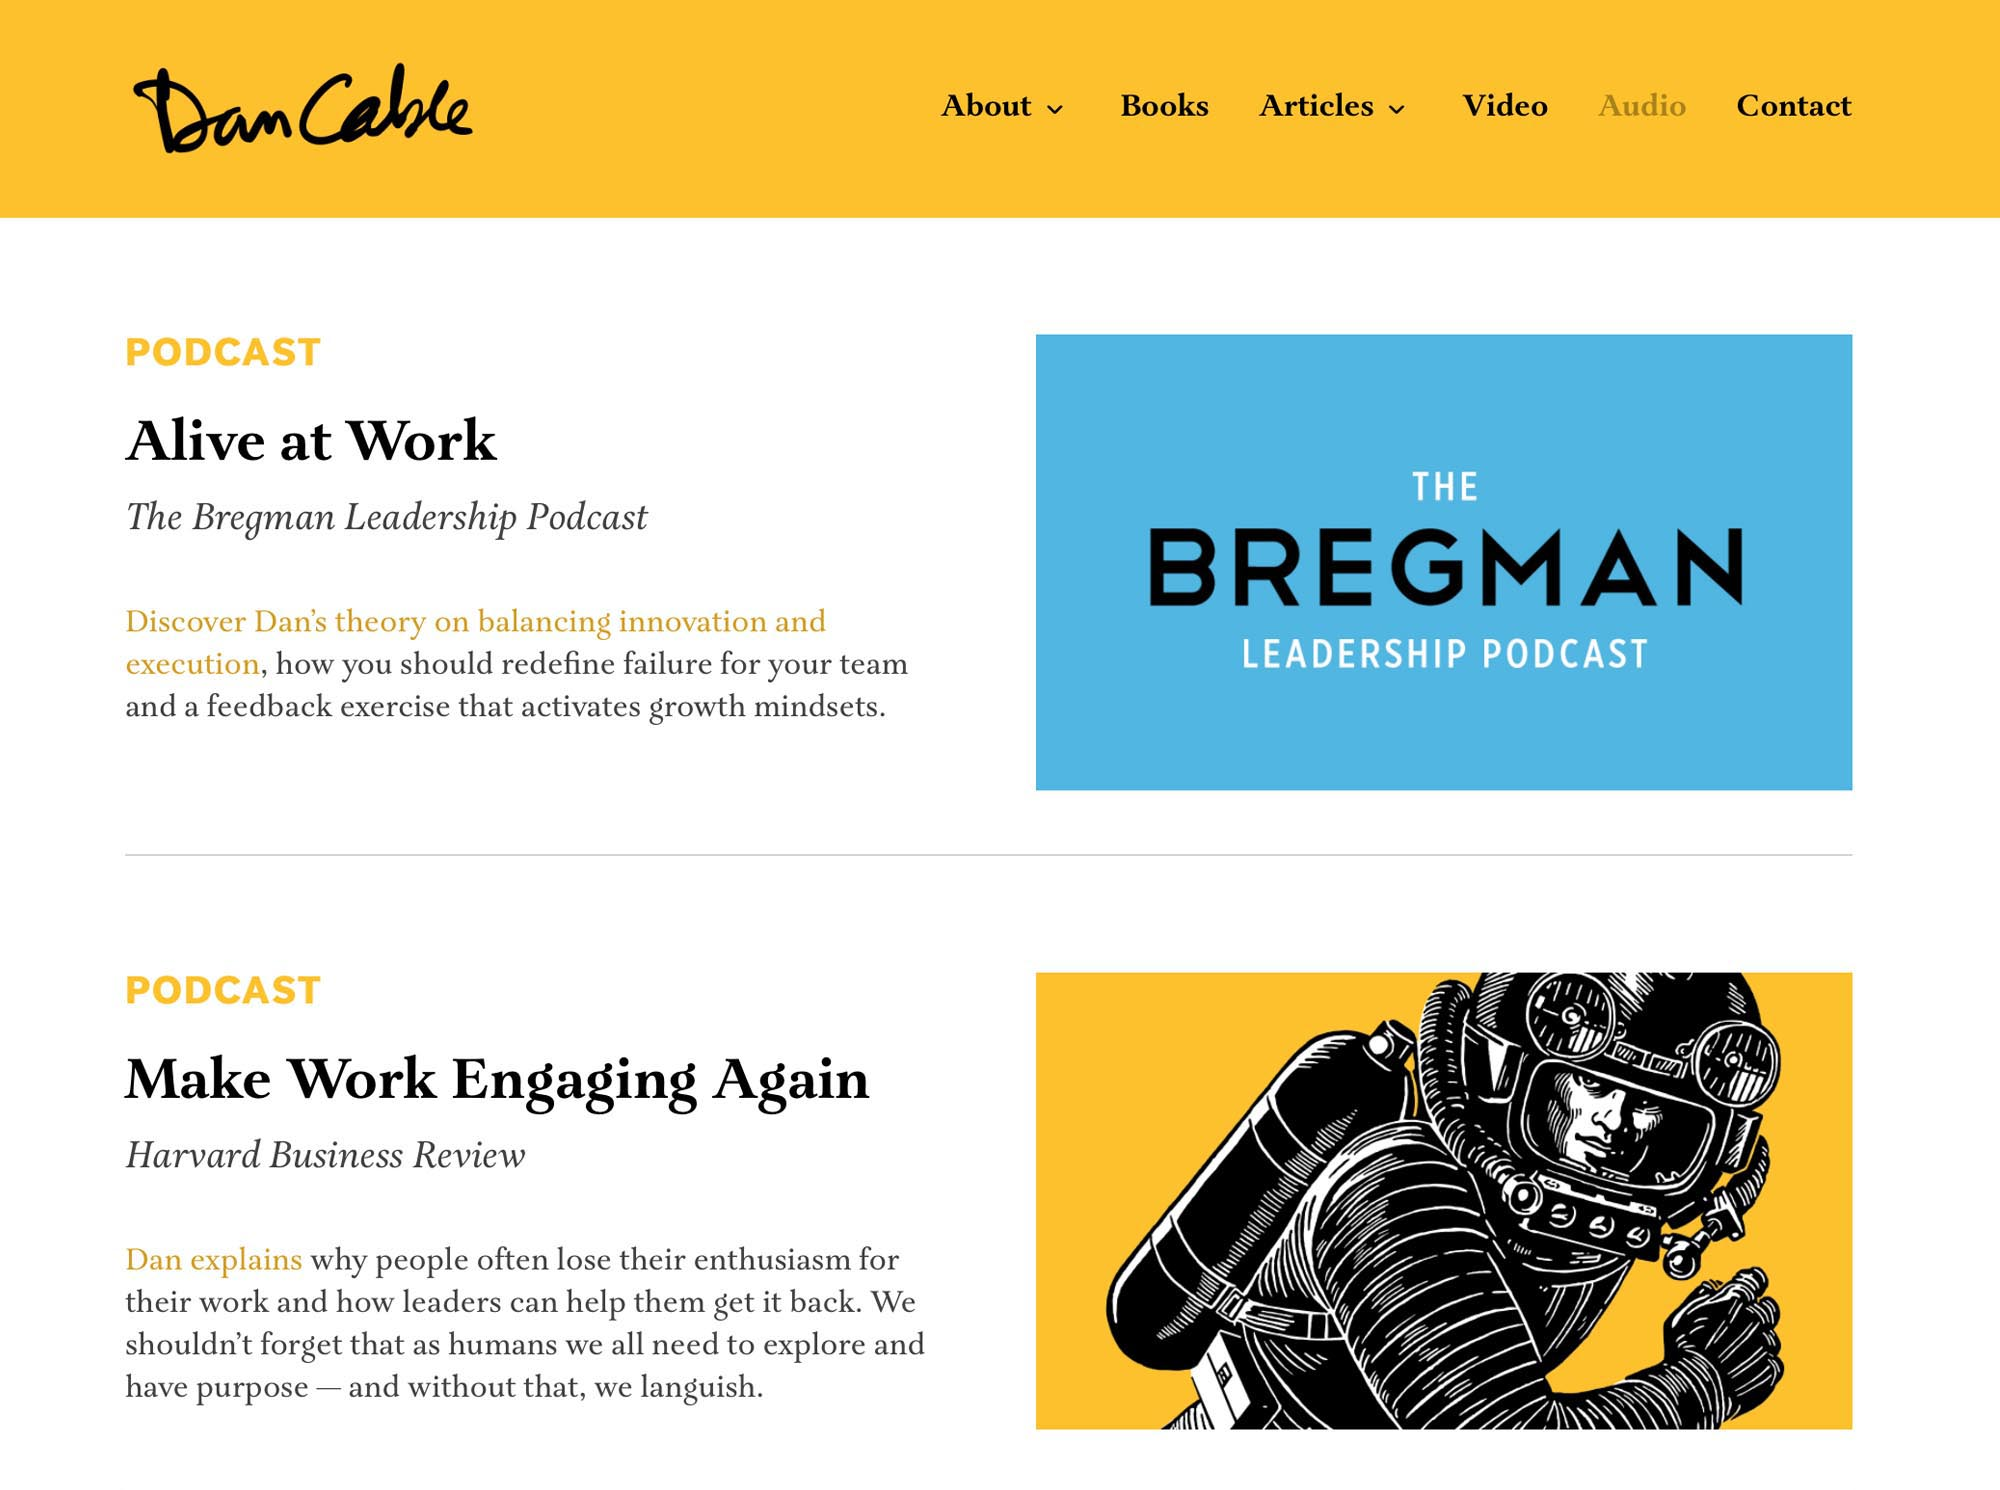 Dan Cable website design